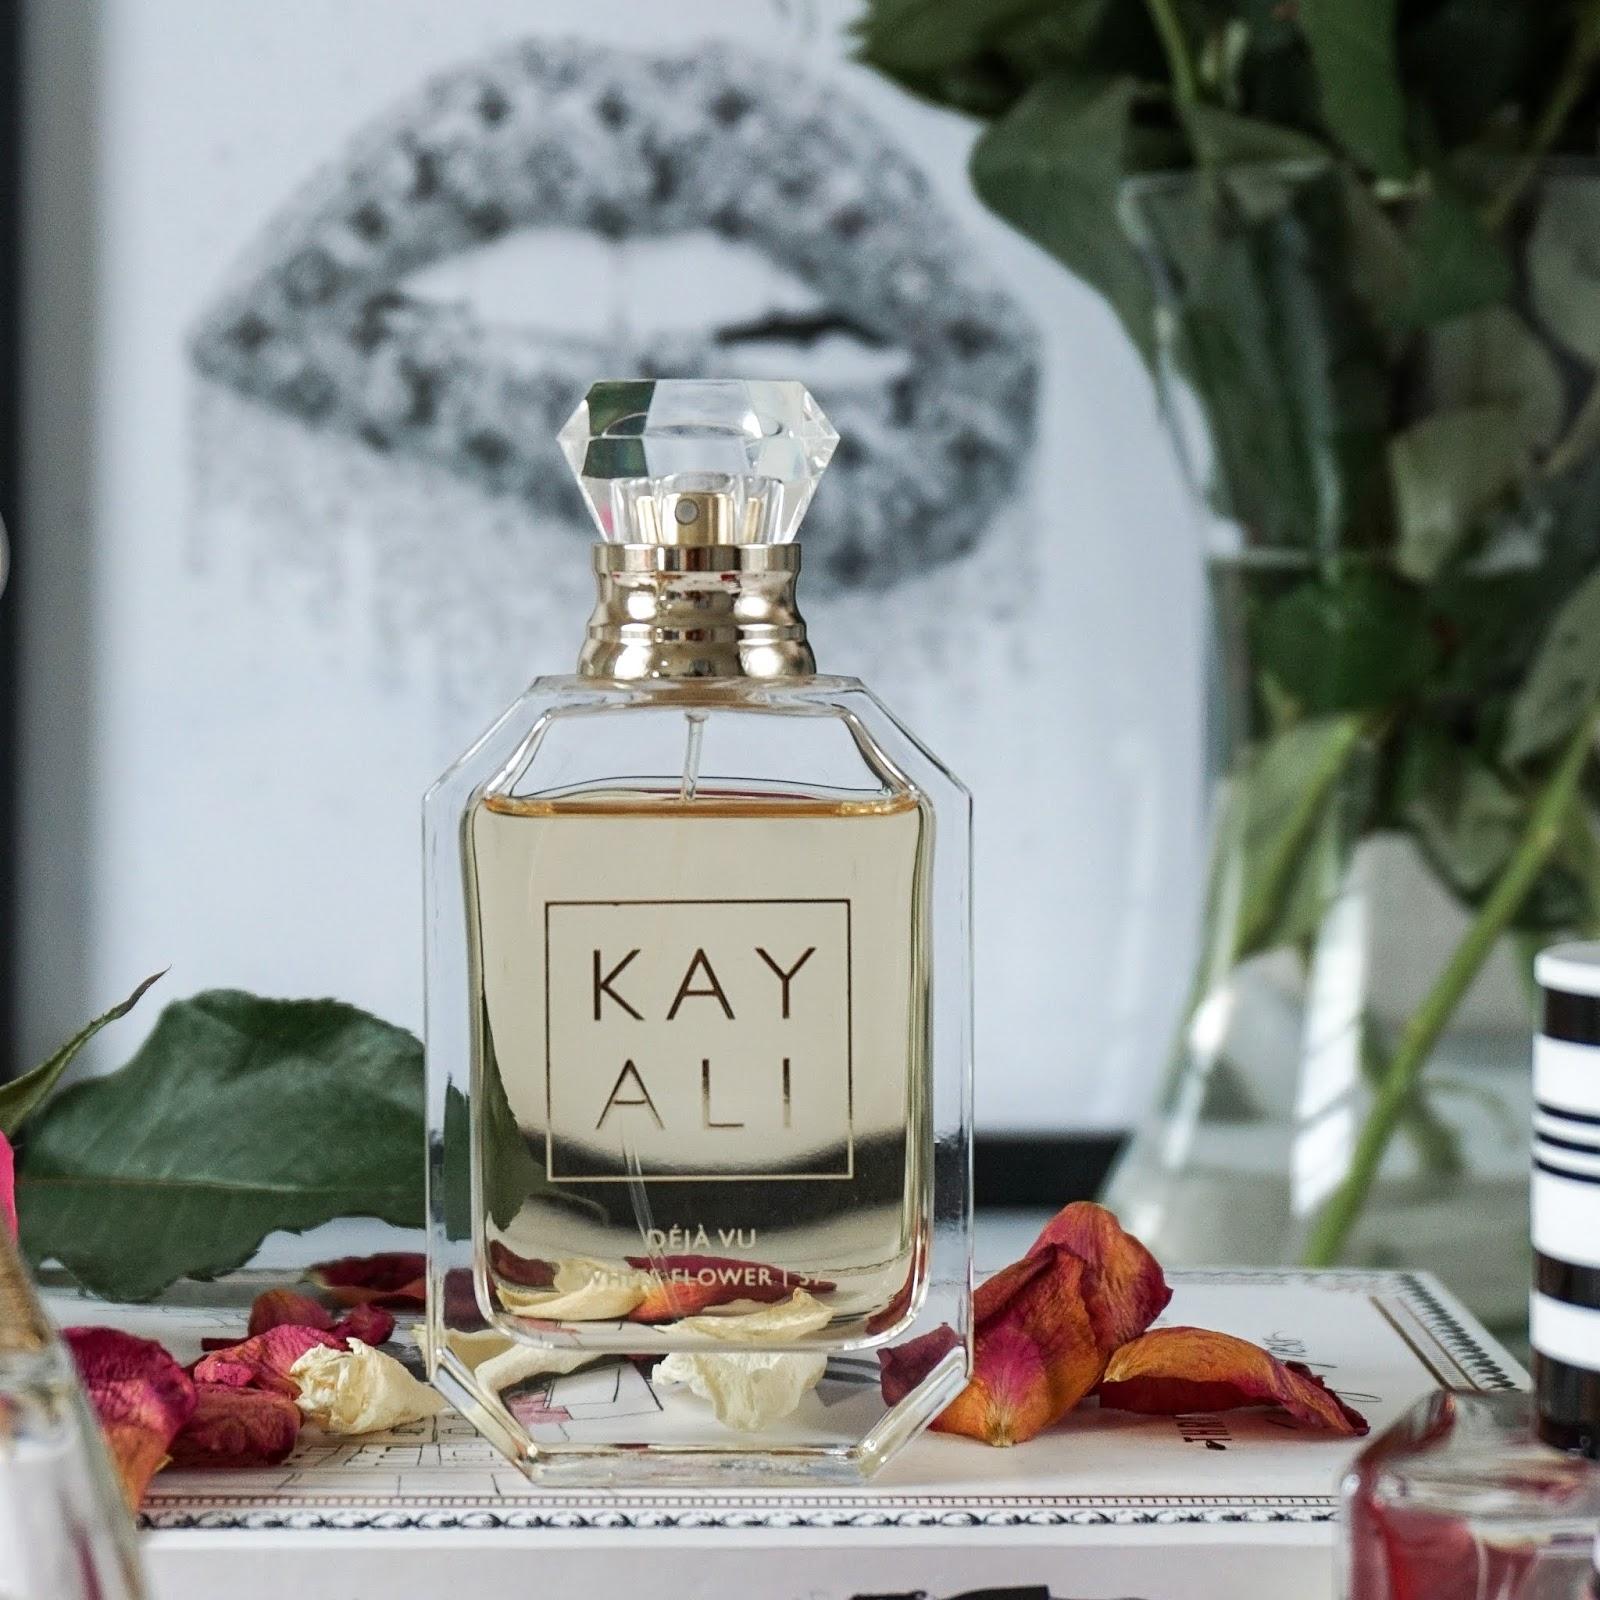 Kayali Deja Vu White Flower